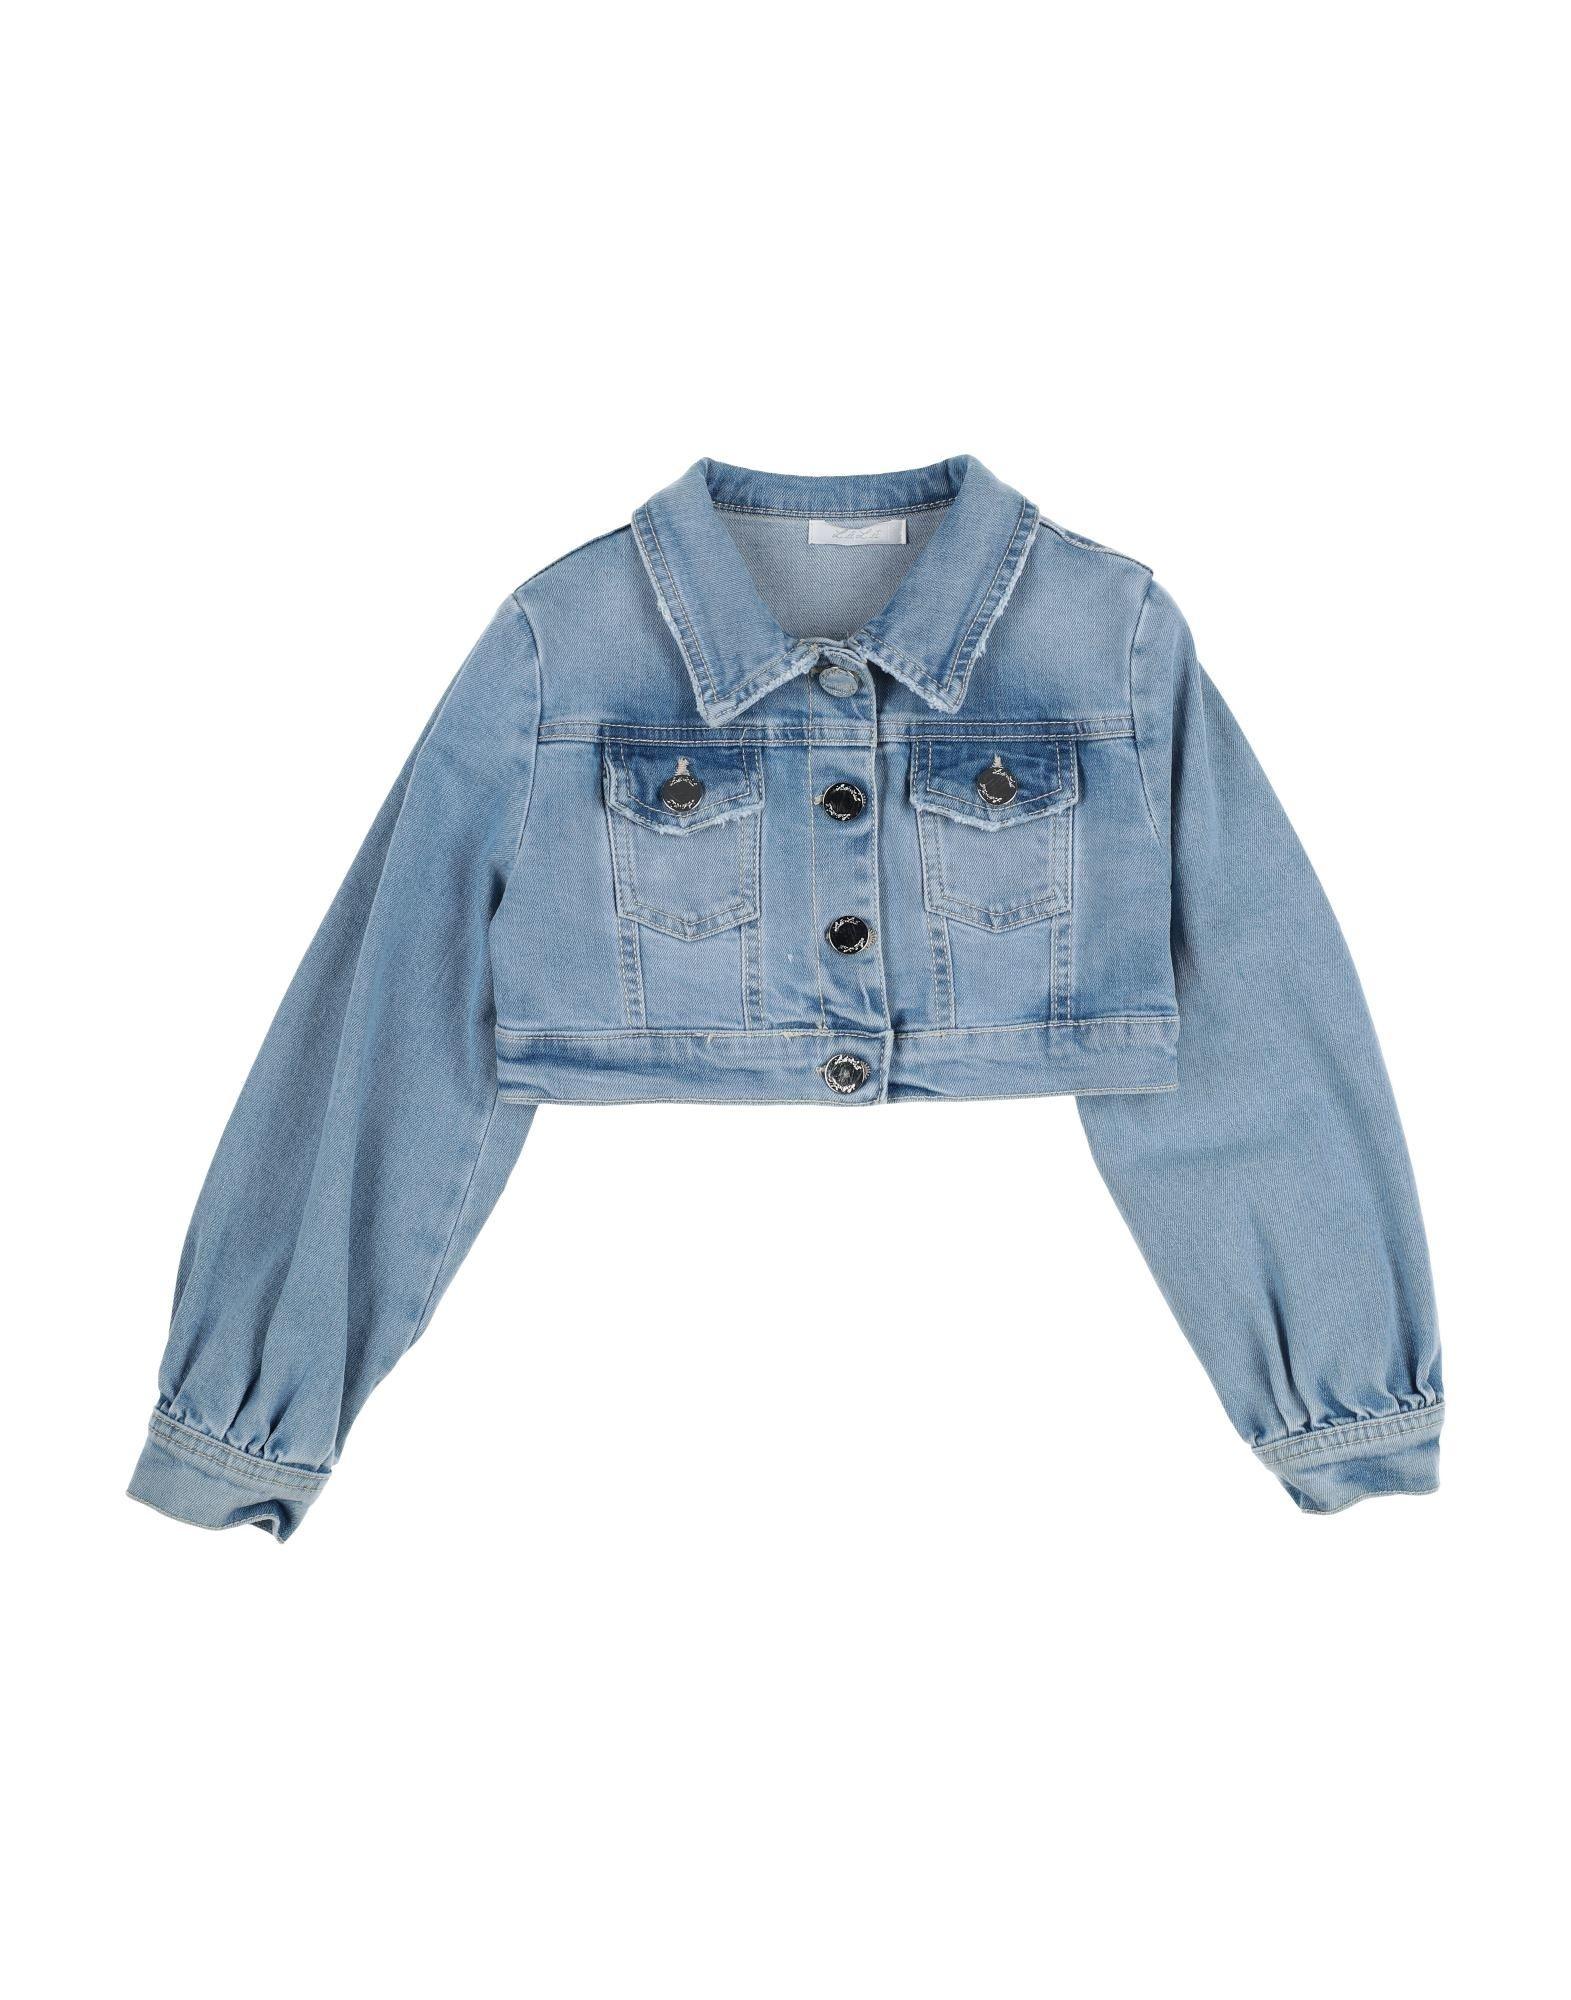 Фото - L:Ú L:Ú by MISS GRANT Джинсовая верхняя одежда microbe by miss grant джинсовая верхняя одежда